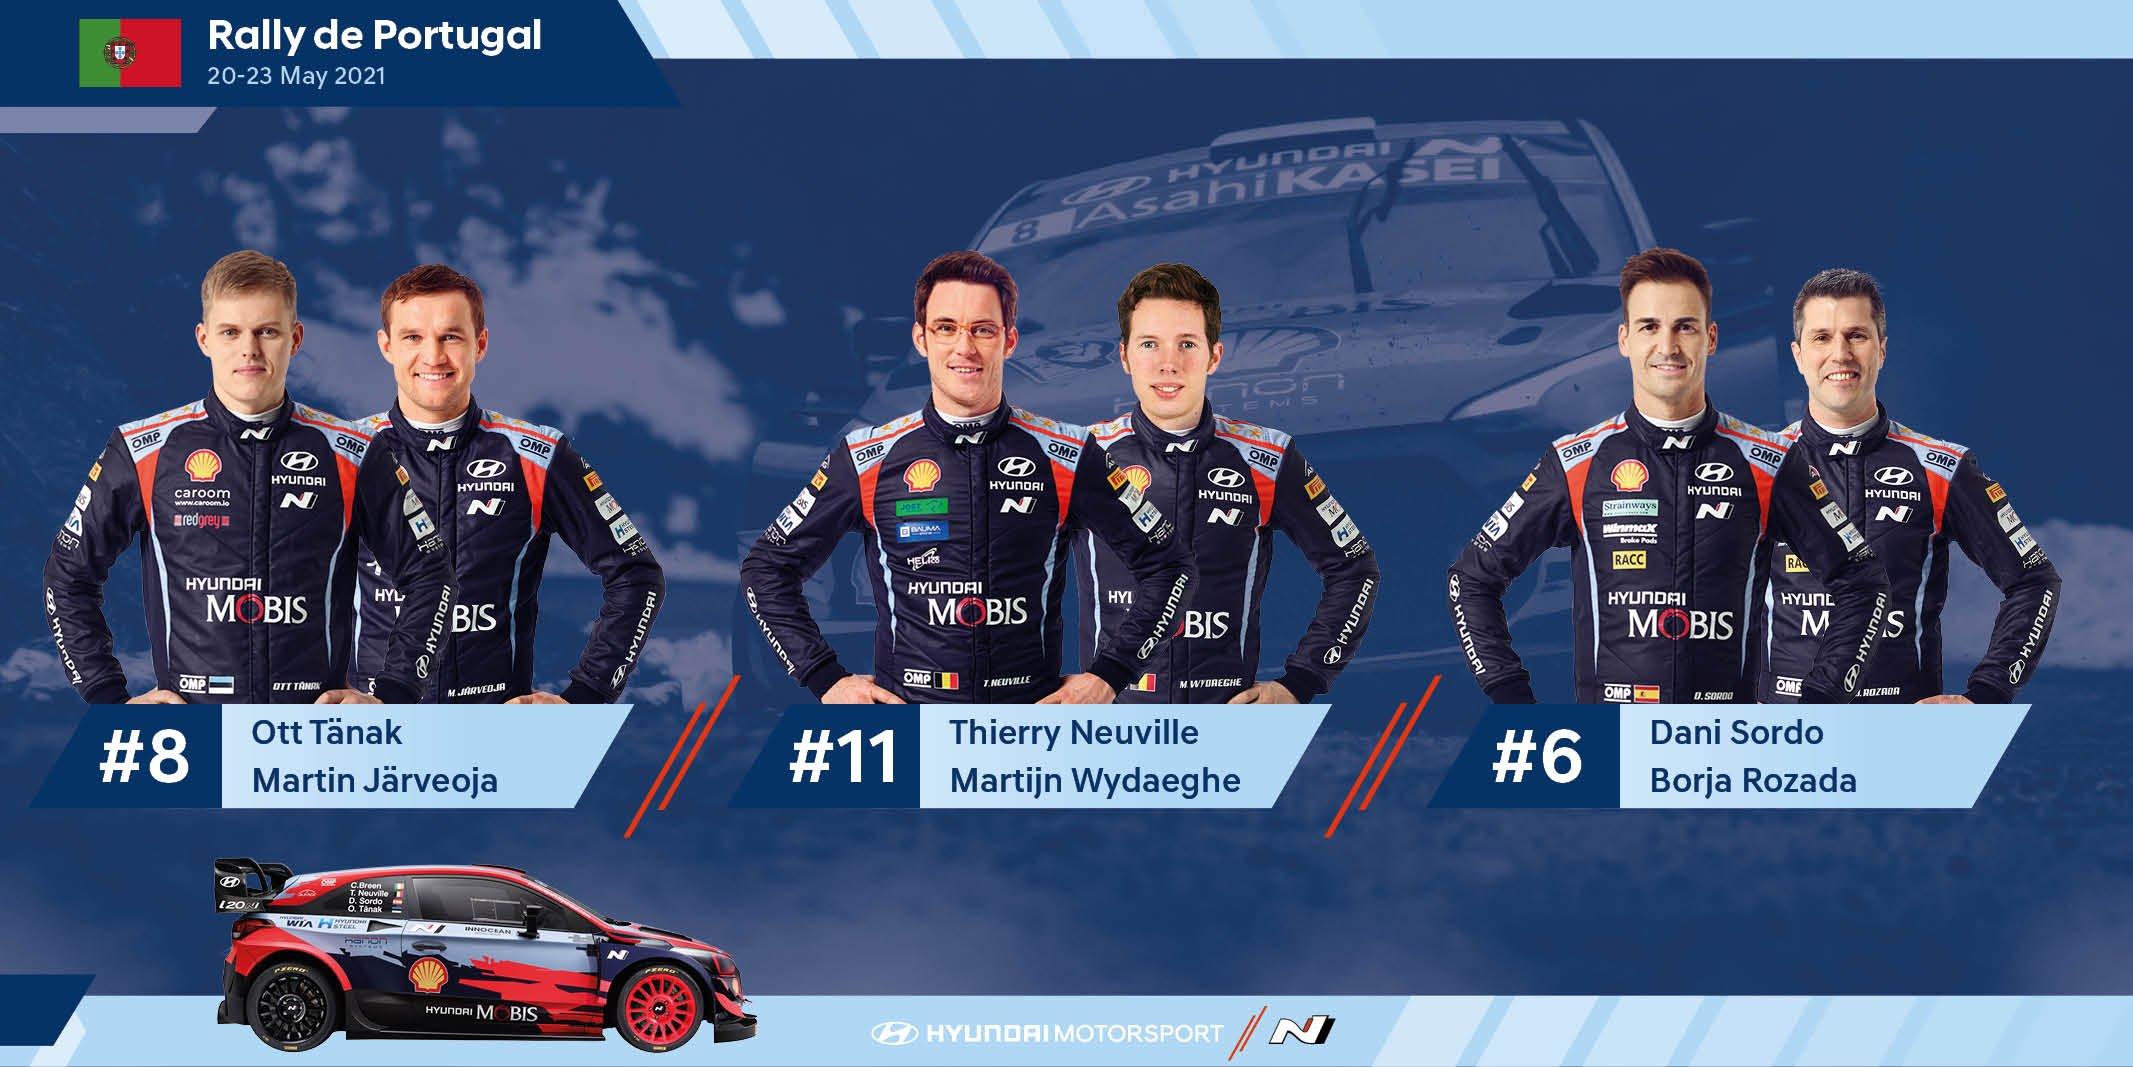 World Rally Championship: Temporada 2021  - Página 21 Ey11SBdWEAAmZ5p?format=jpg&name=4096x4096